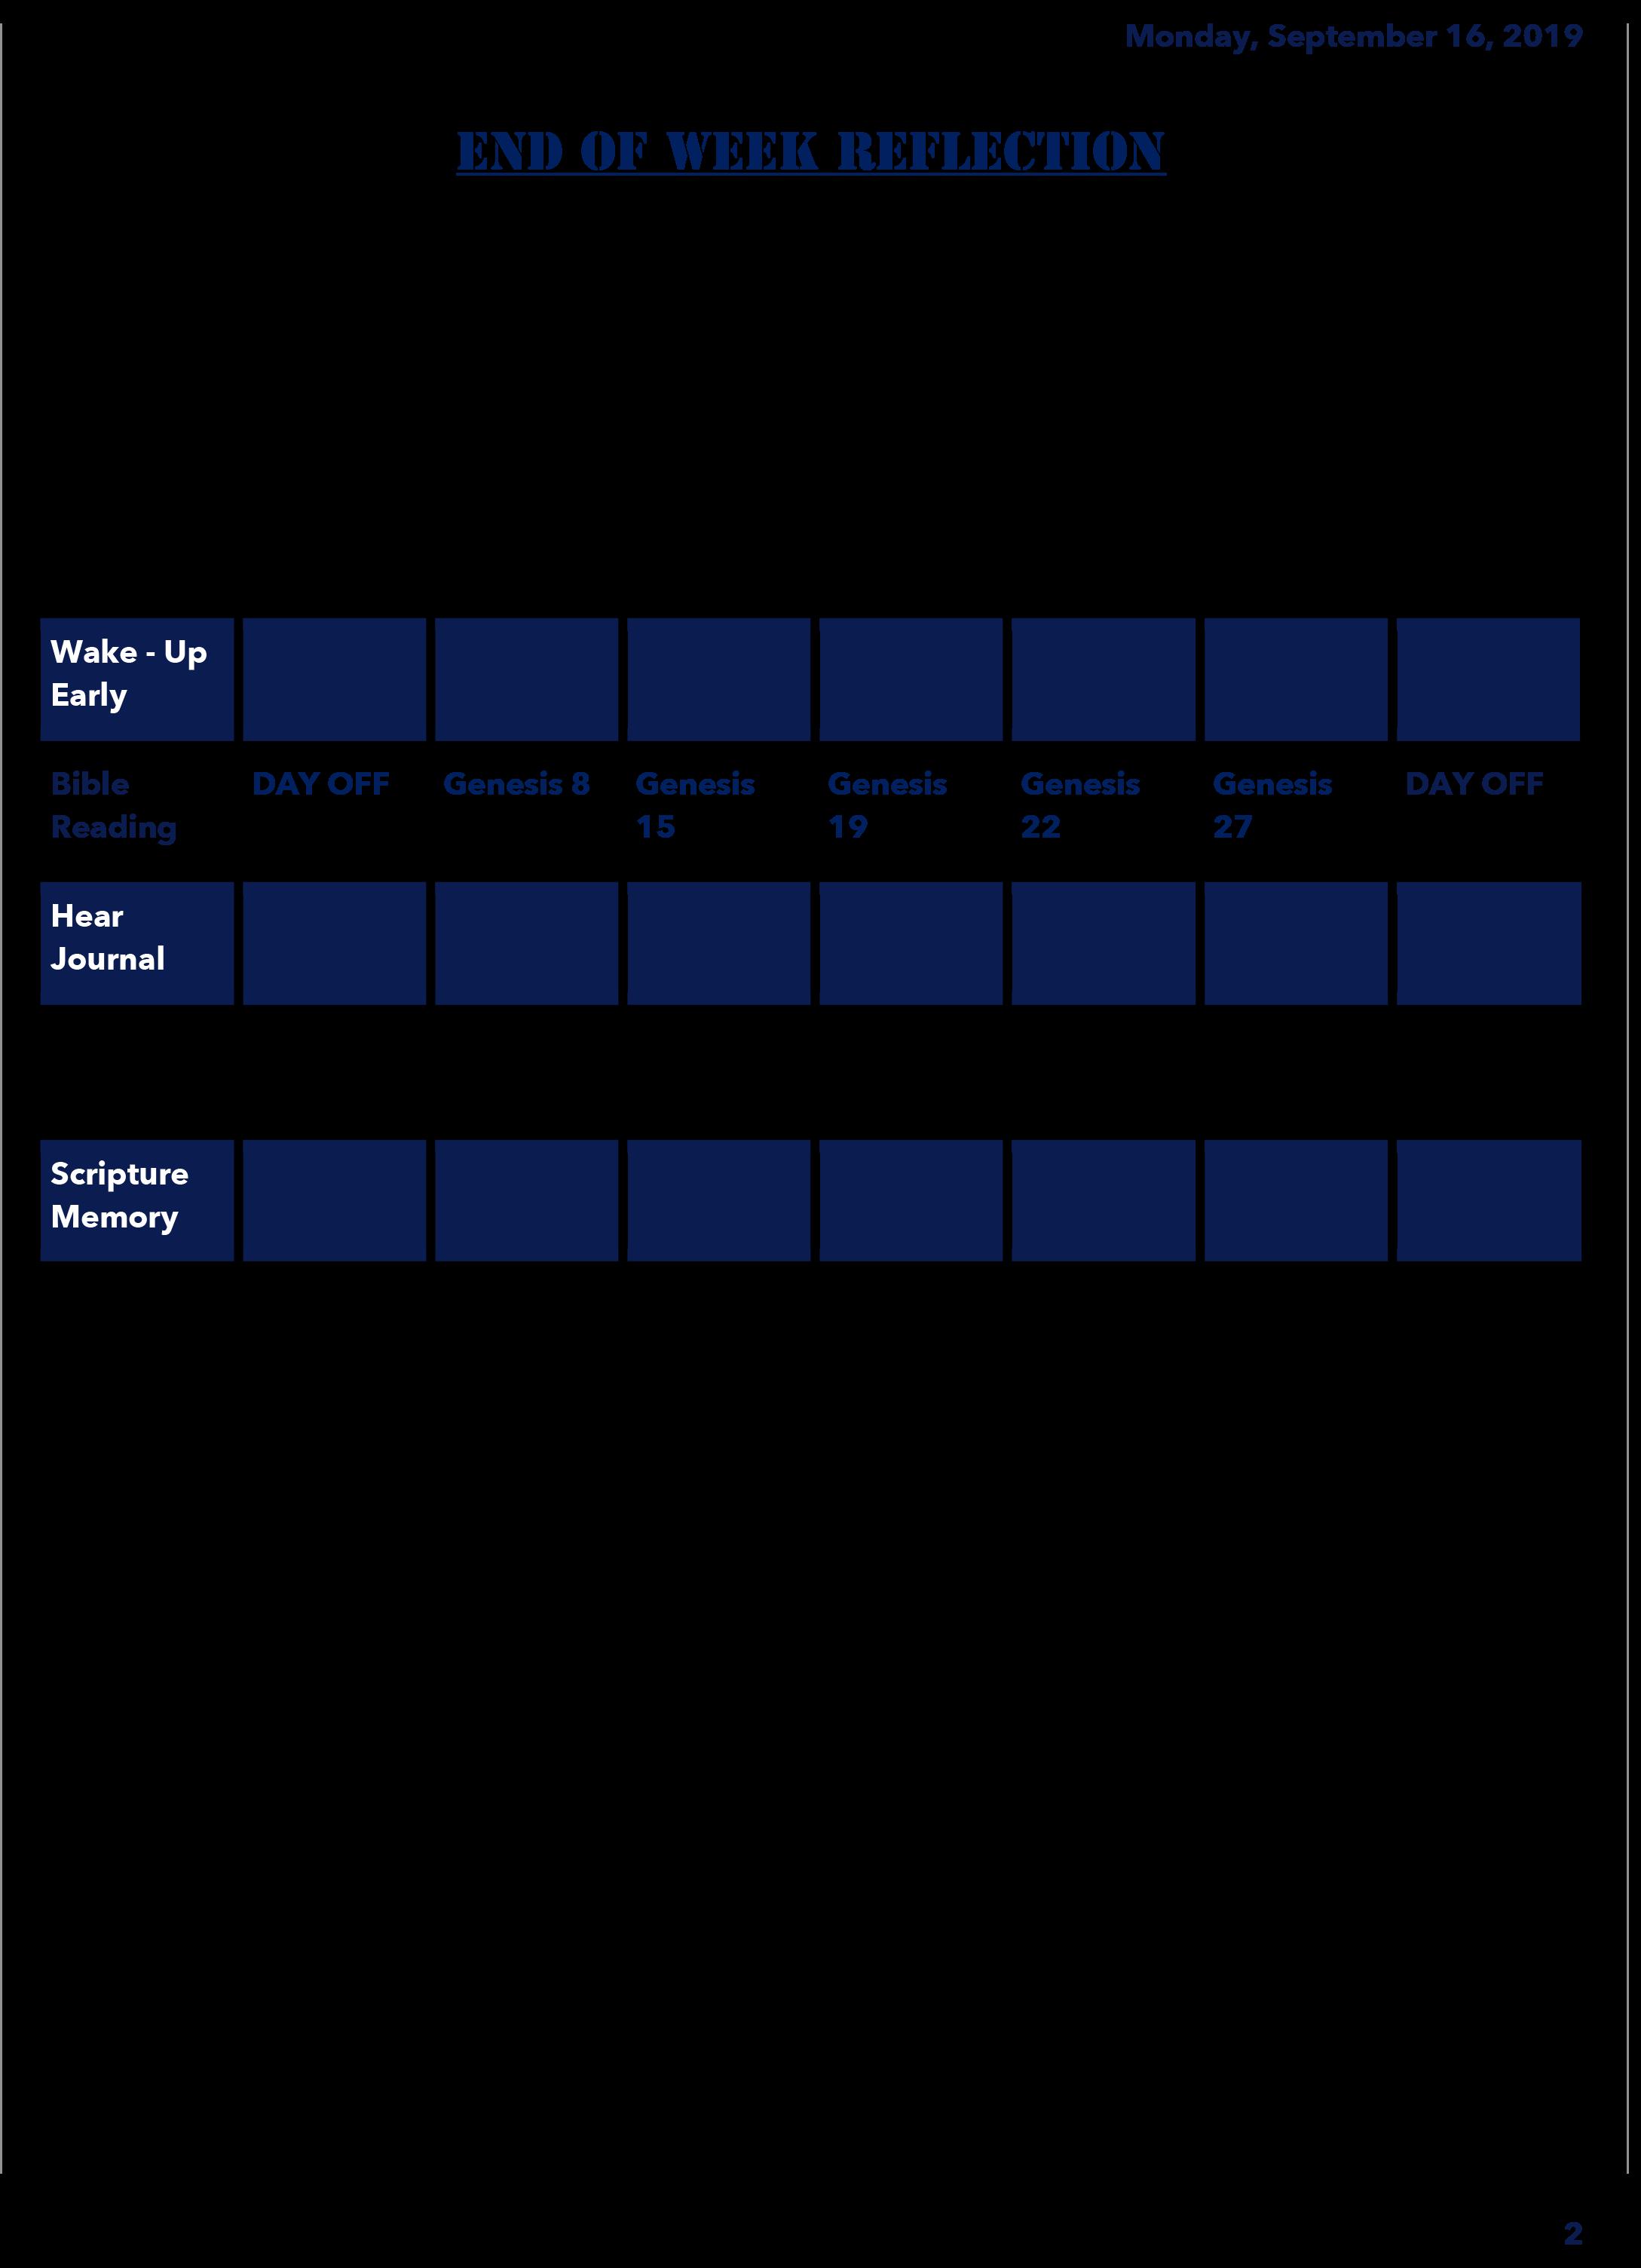 Battle Plan (9.16.19)-2.png